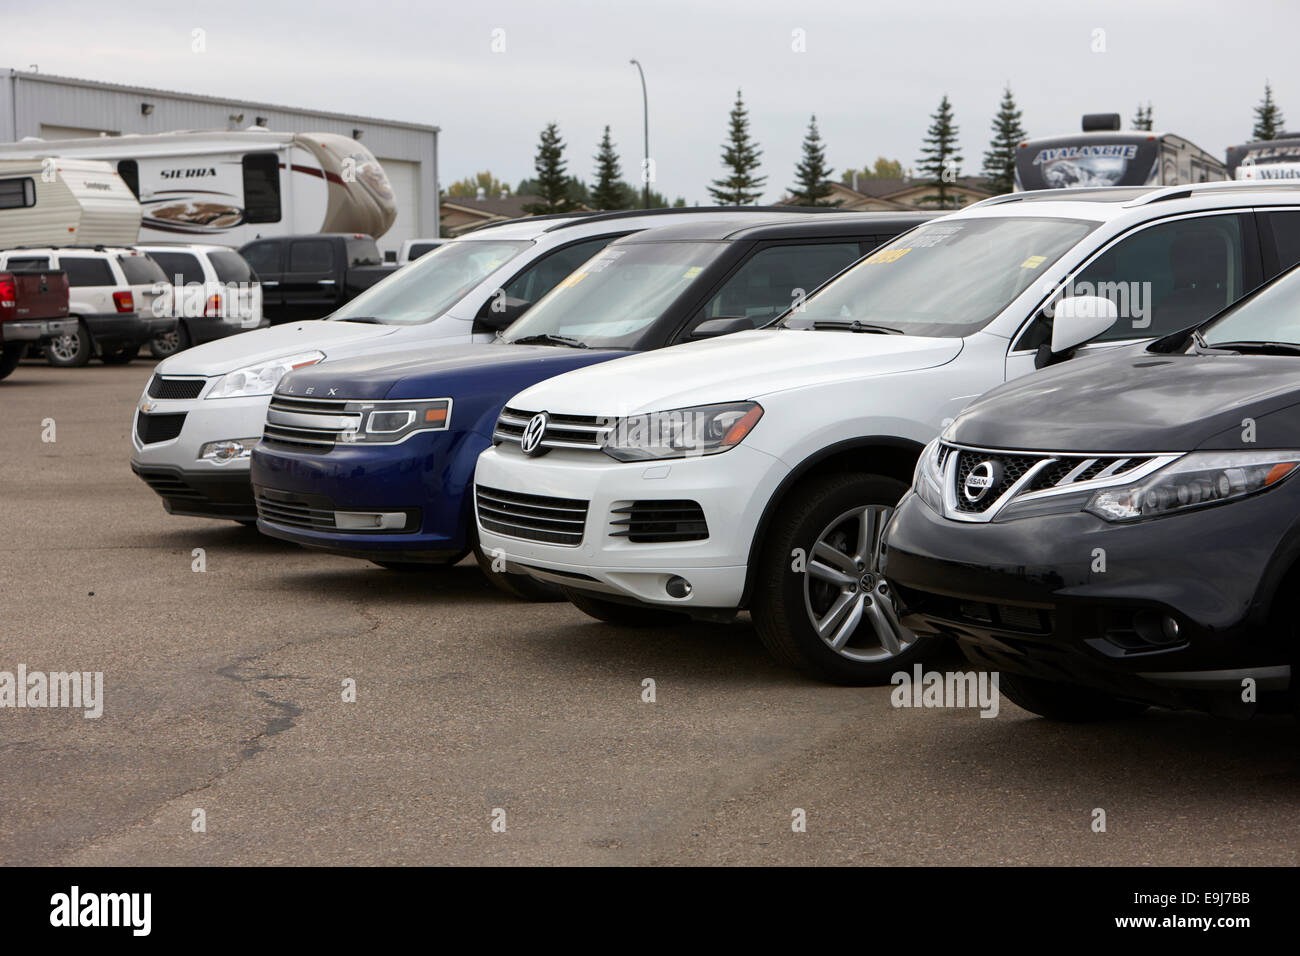 used car dealership Saskatchewan Canada Stock Photo, Royalty Free ...